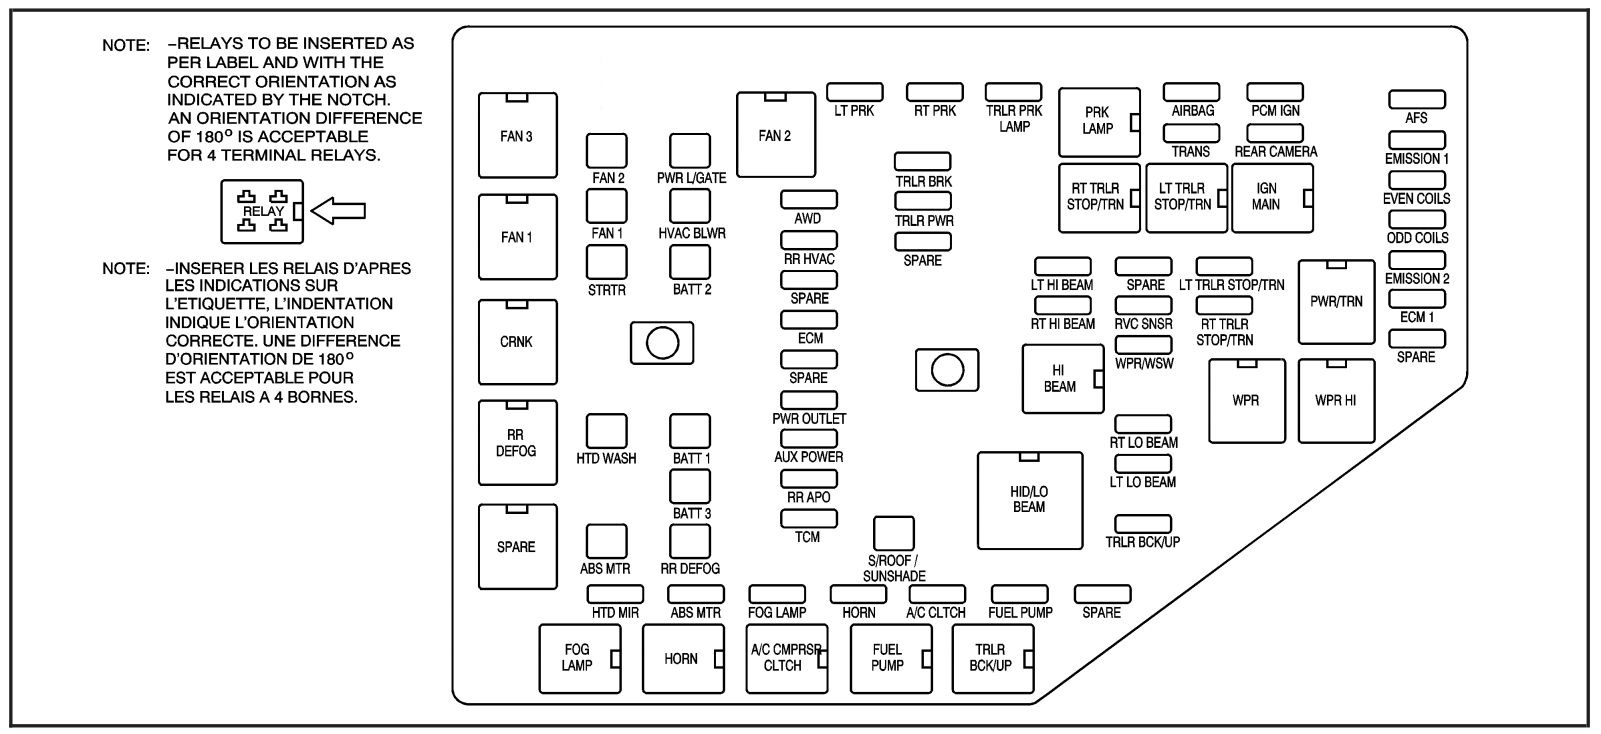 2008 Gmc Acadia Fuse Box Location - Wiring Diagram G11 Acadia Fuse Box Location on